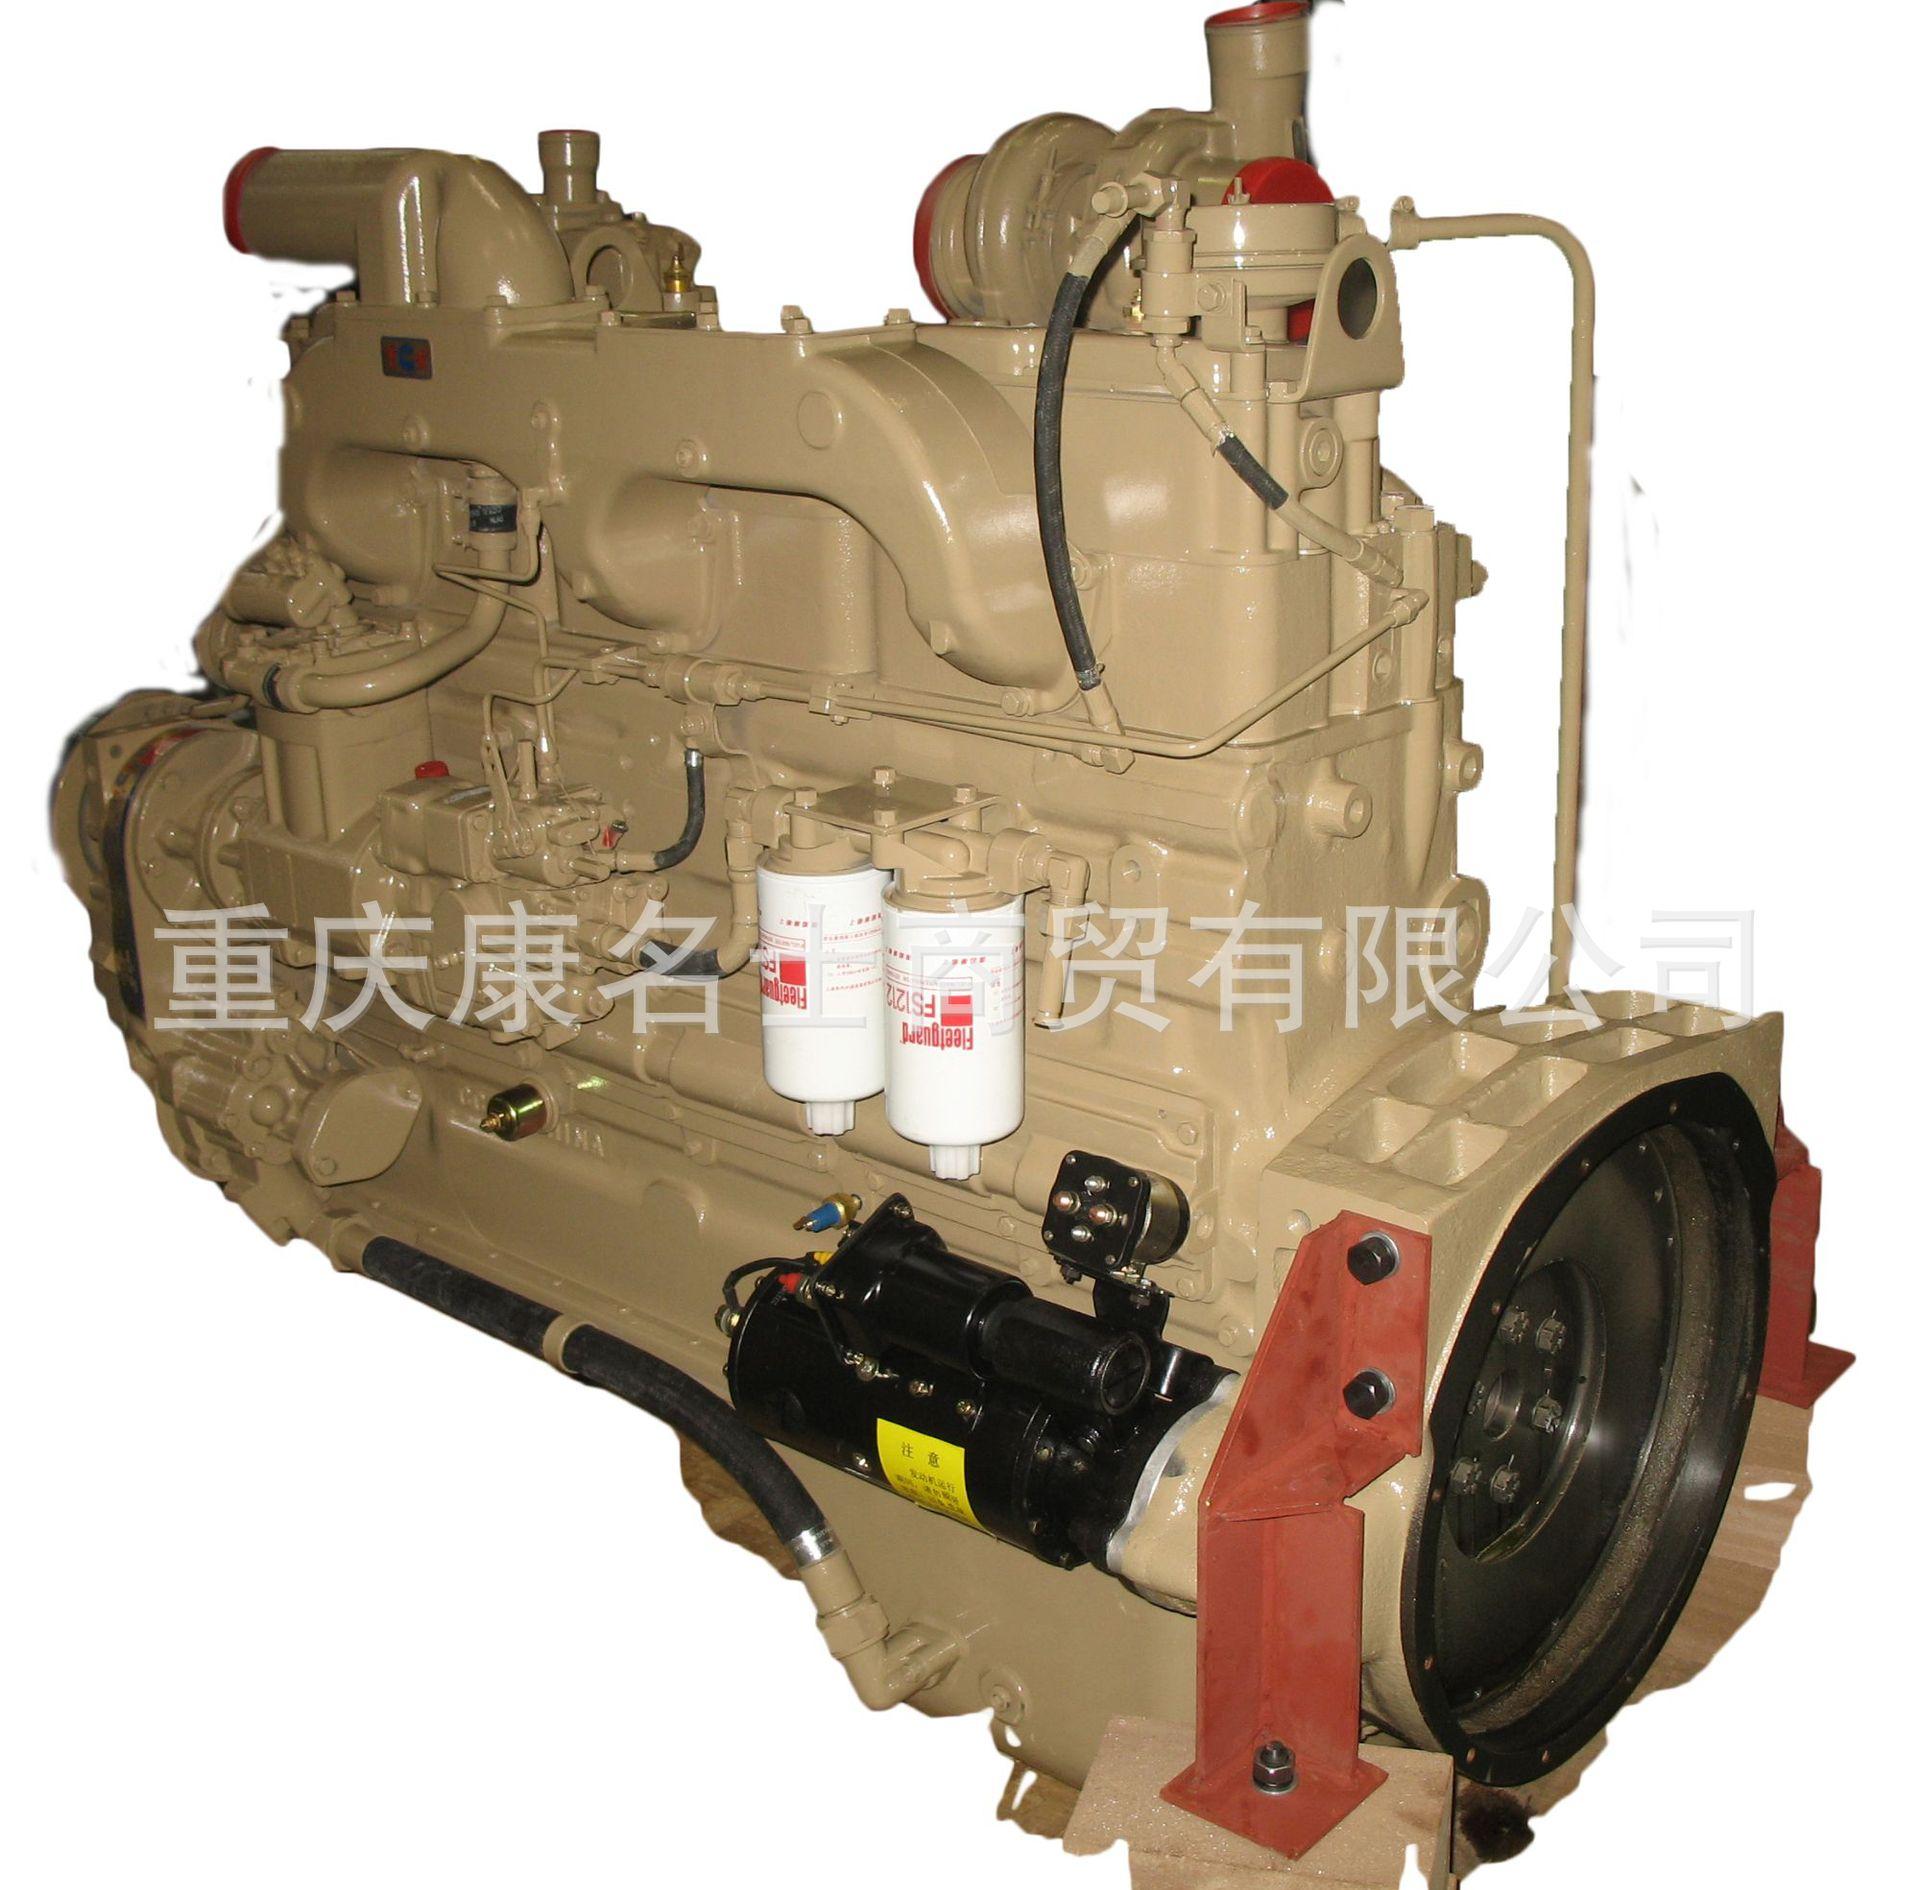 HX1144康明斯散热器NTA855-GENDR(535)发动机配件厂价优惠